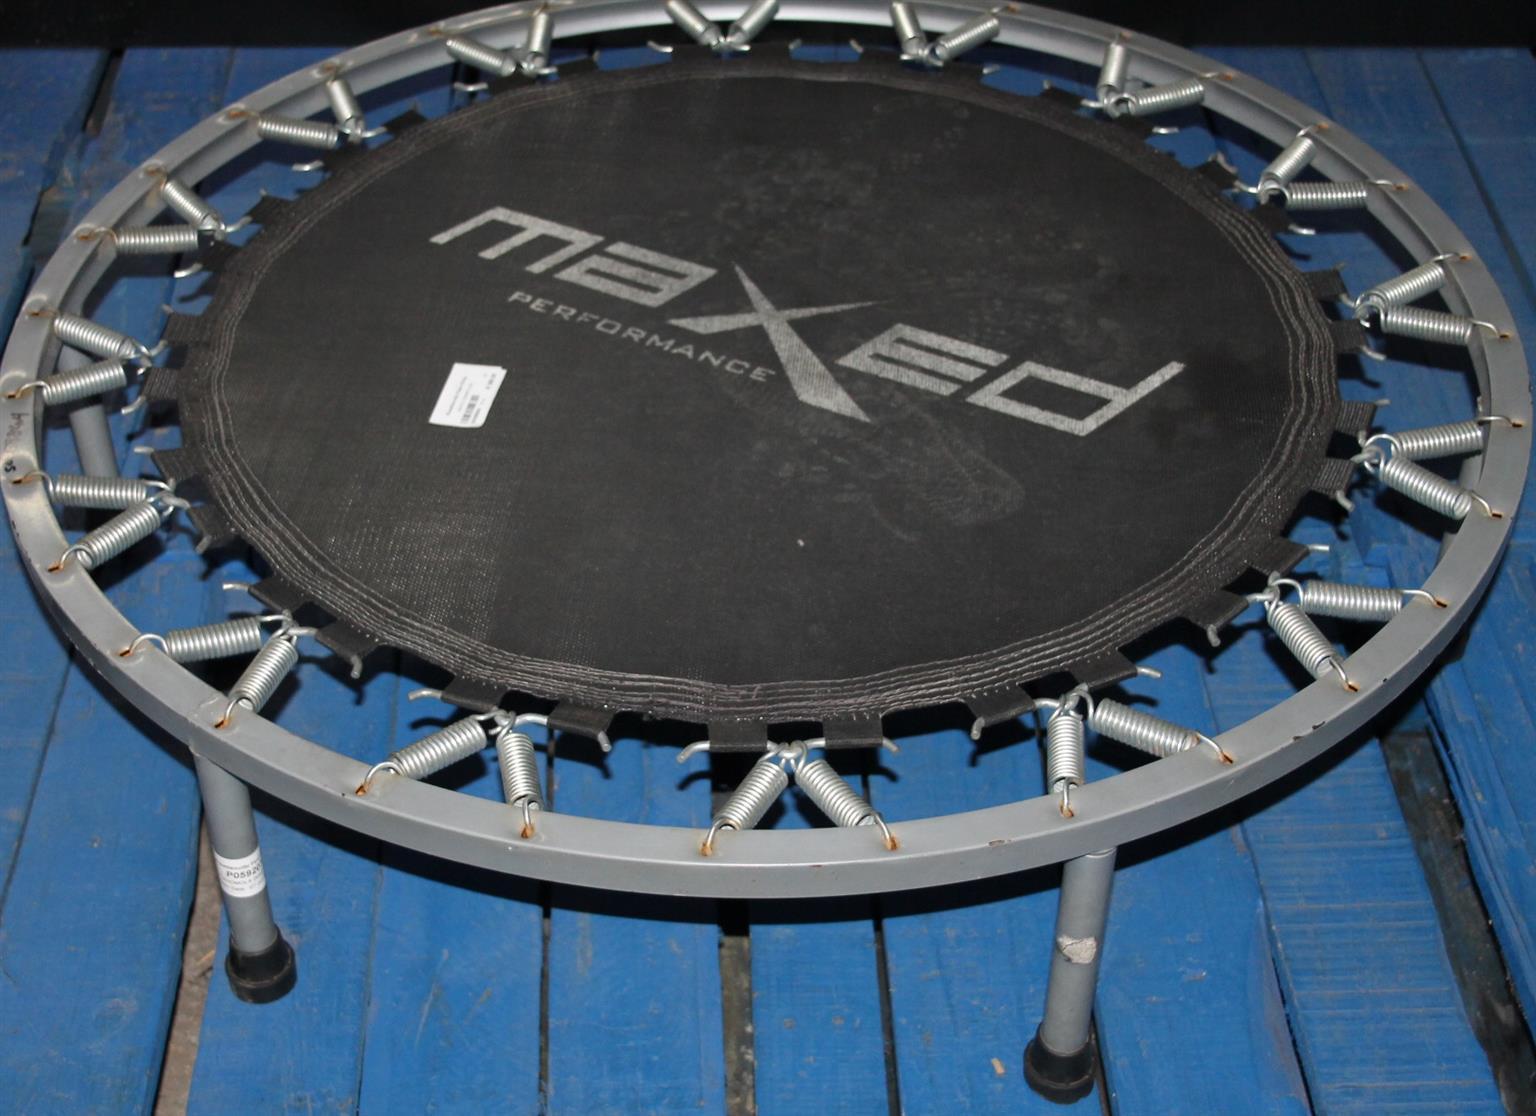 S035884A Maxed trampoline #Rosettenvillepawnshop